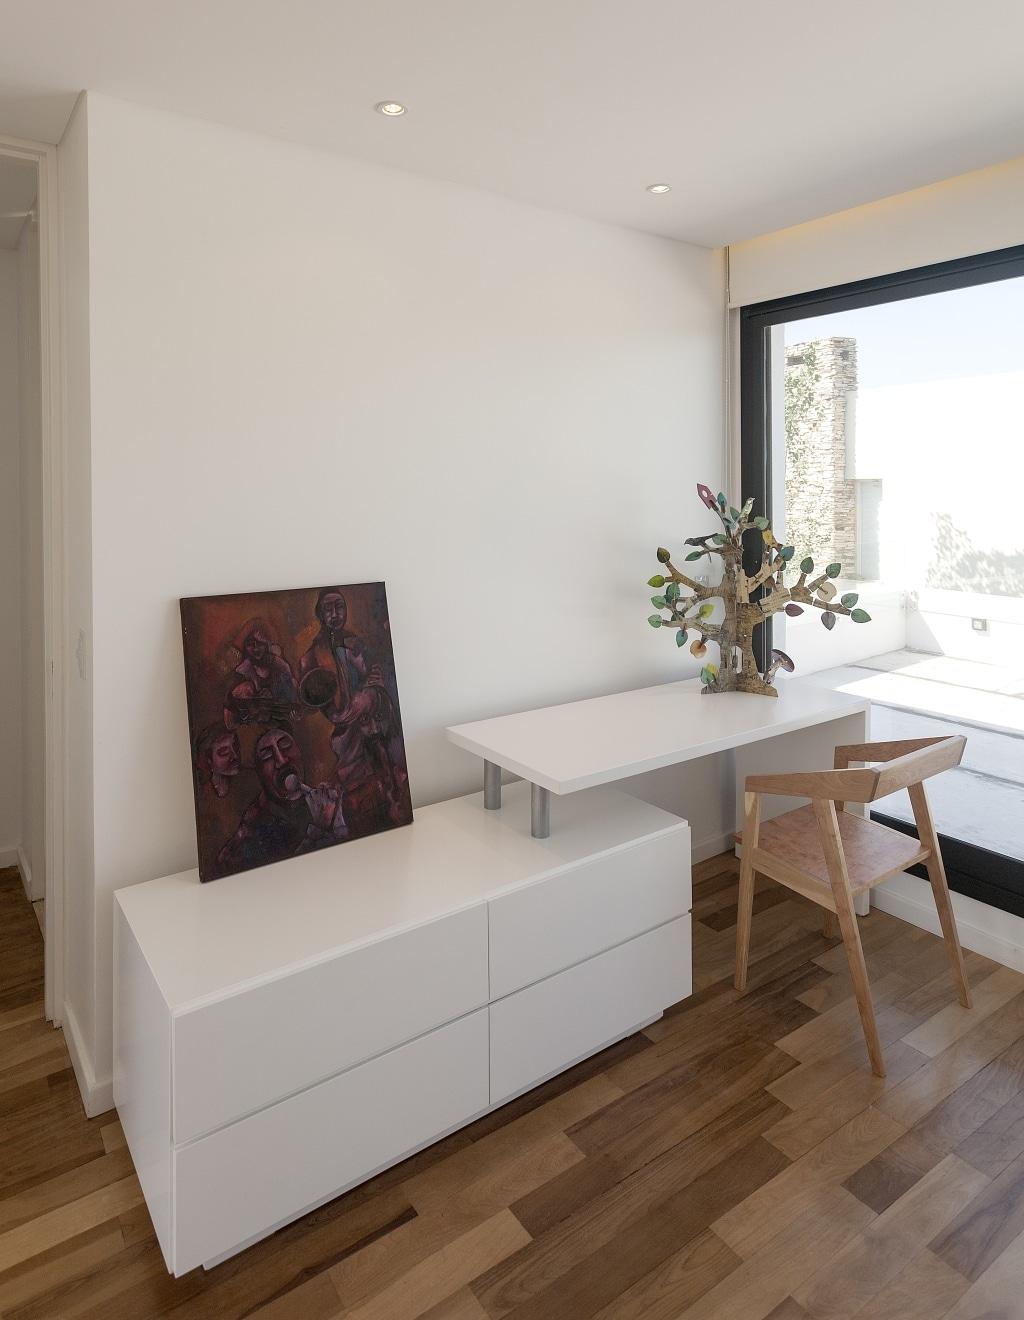 Planos de casa de dos pisos moderna for Casa minimalista 2 dormitorios